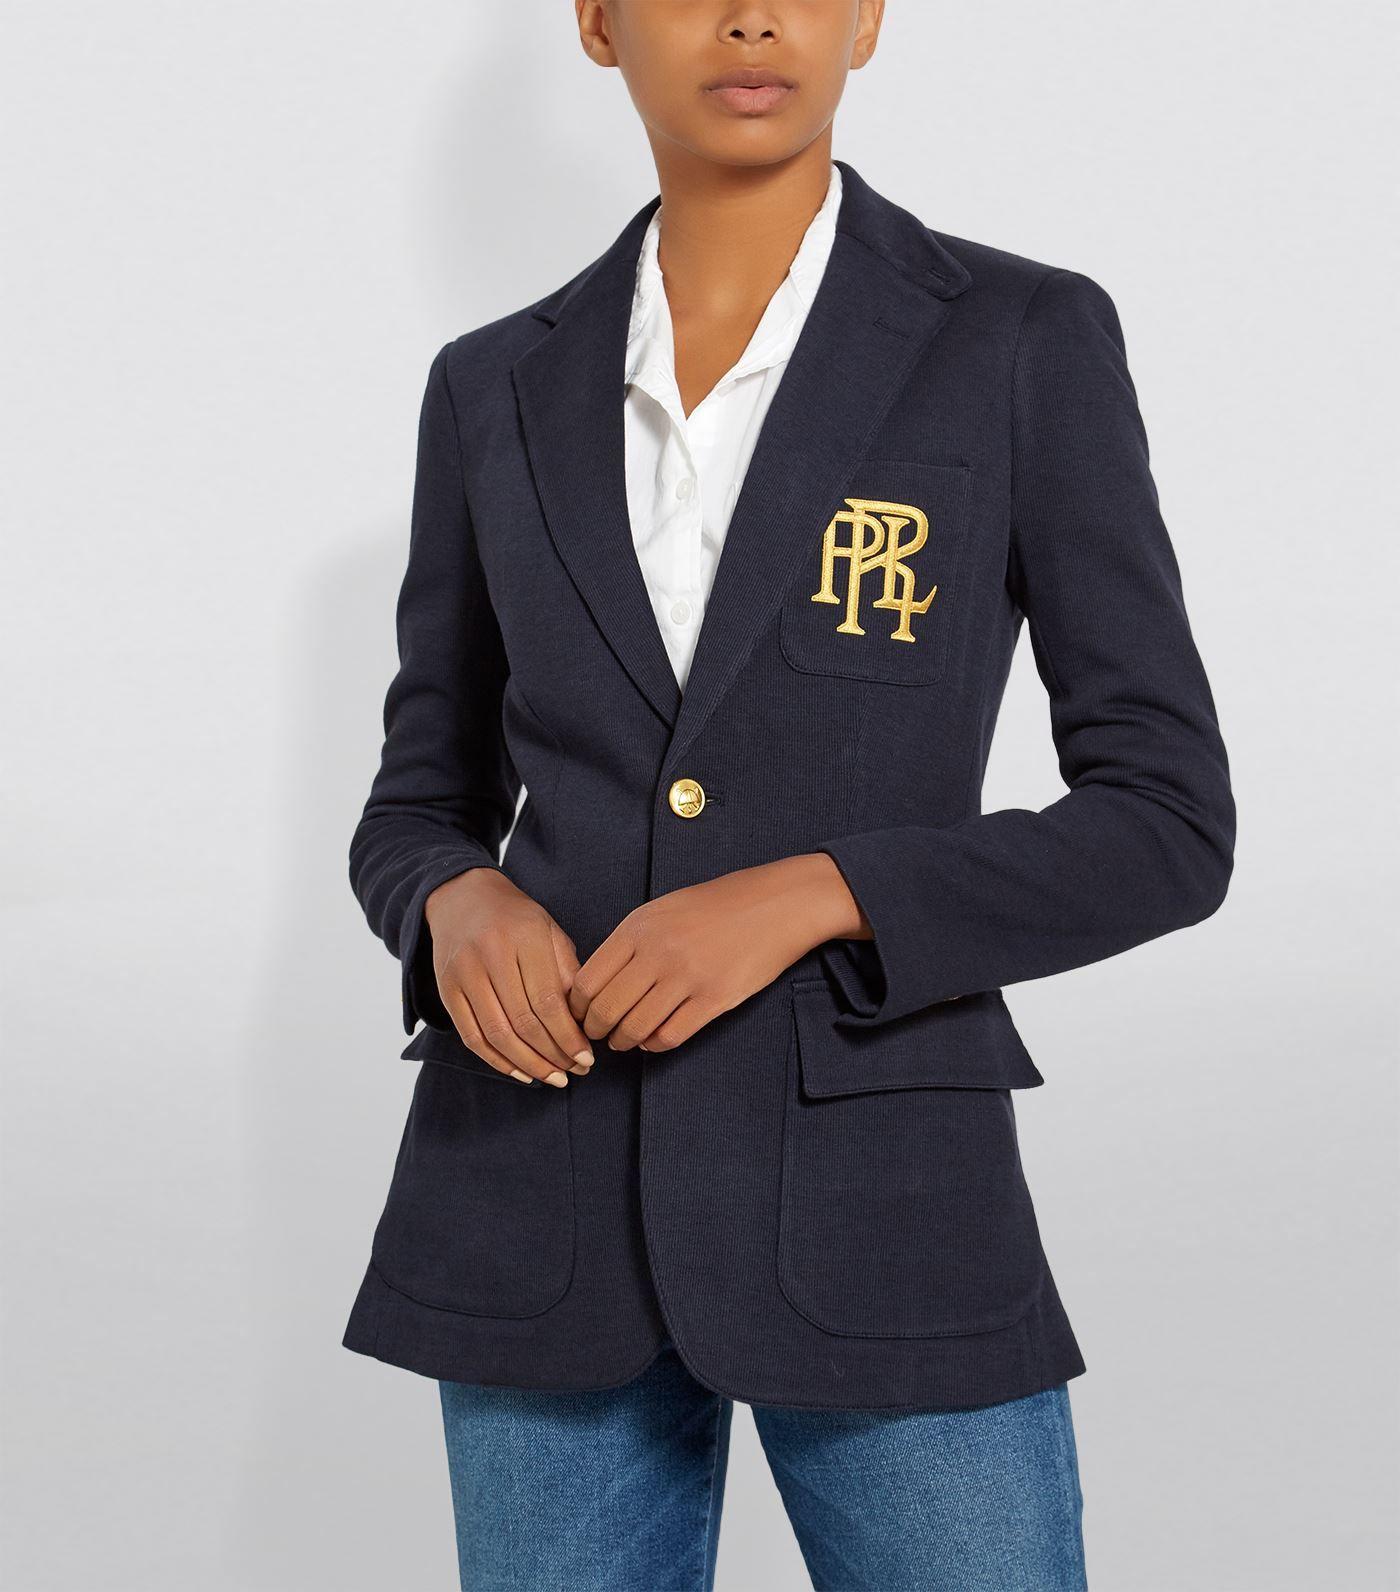 Polo Ralph Lauren Knitted Cotton Blazer Ad Ad Lauren Ralph Polo Blazer Cotton Cotton Blazer Blazer Polo Ralph Lauren